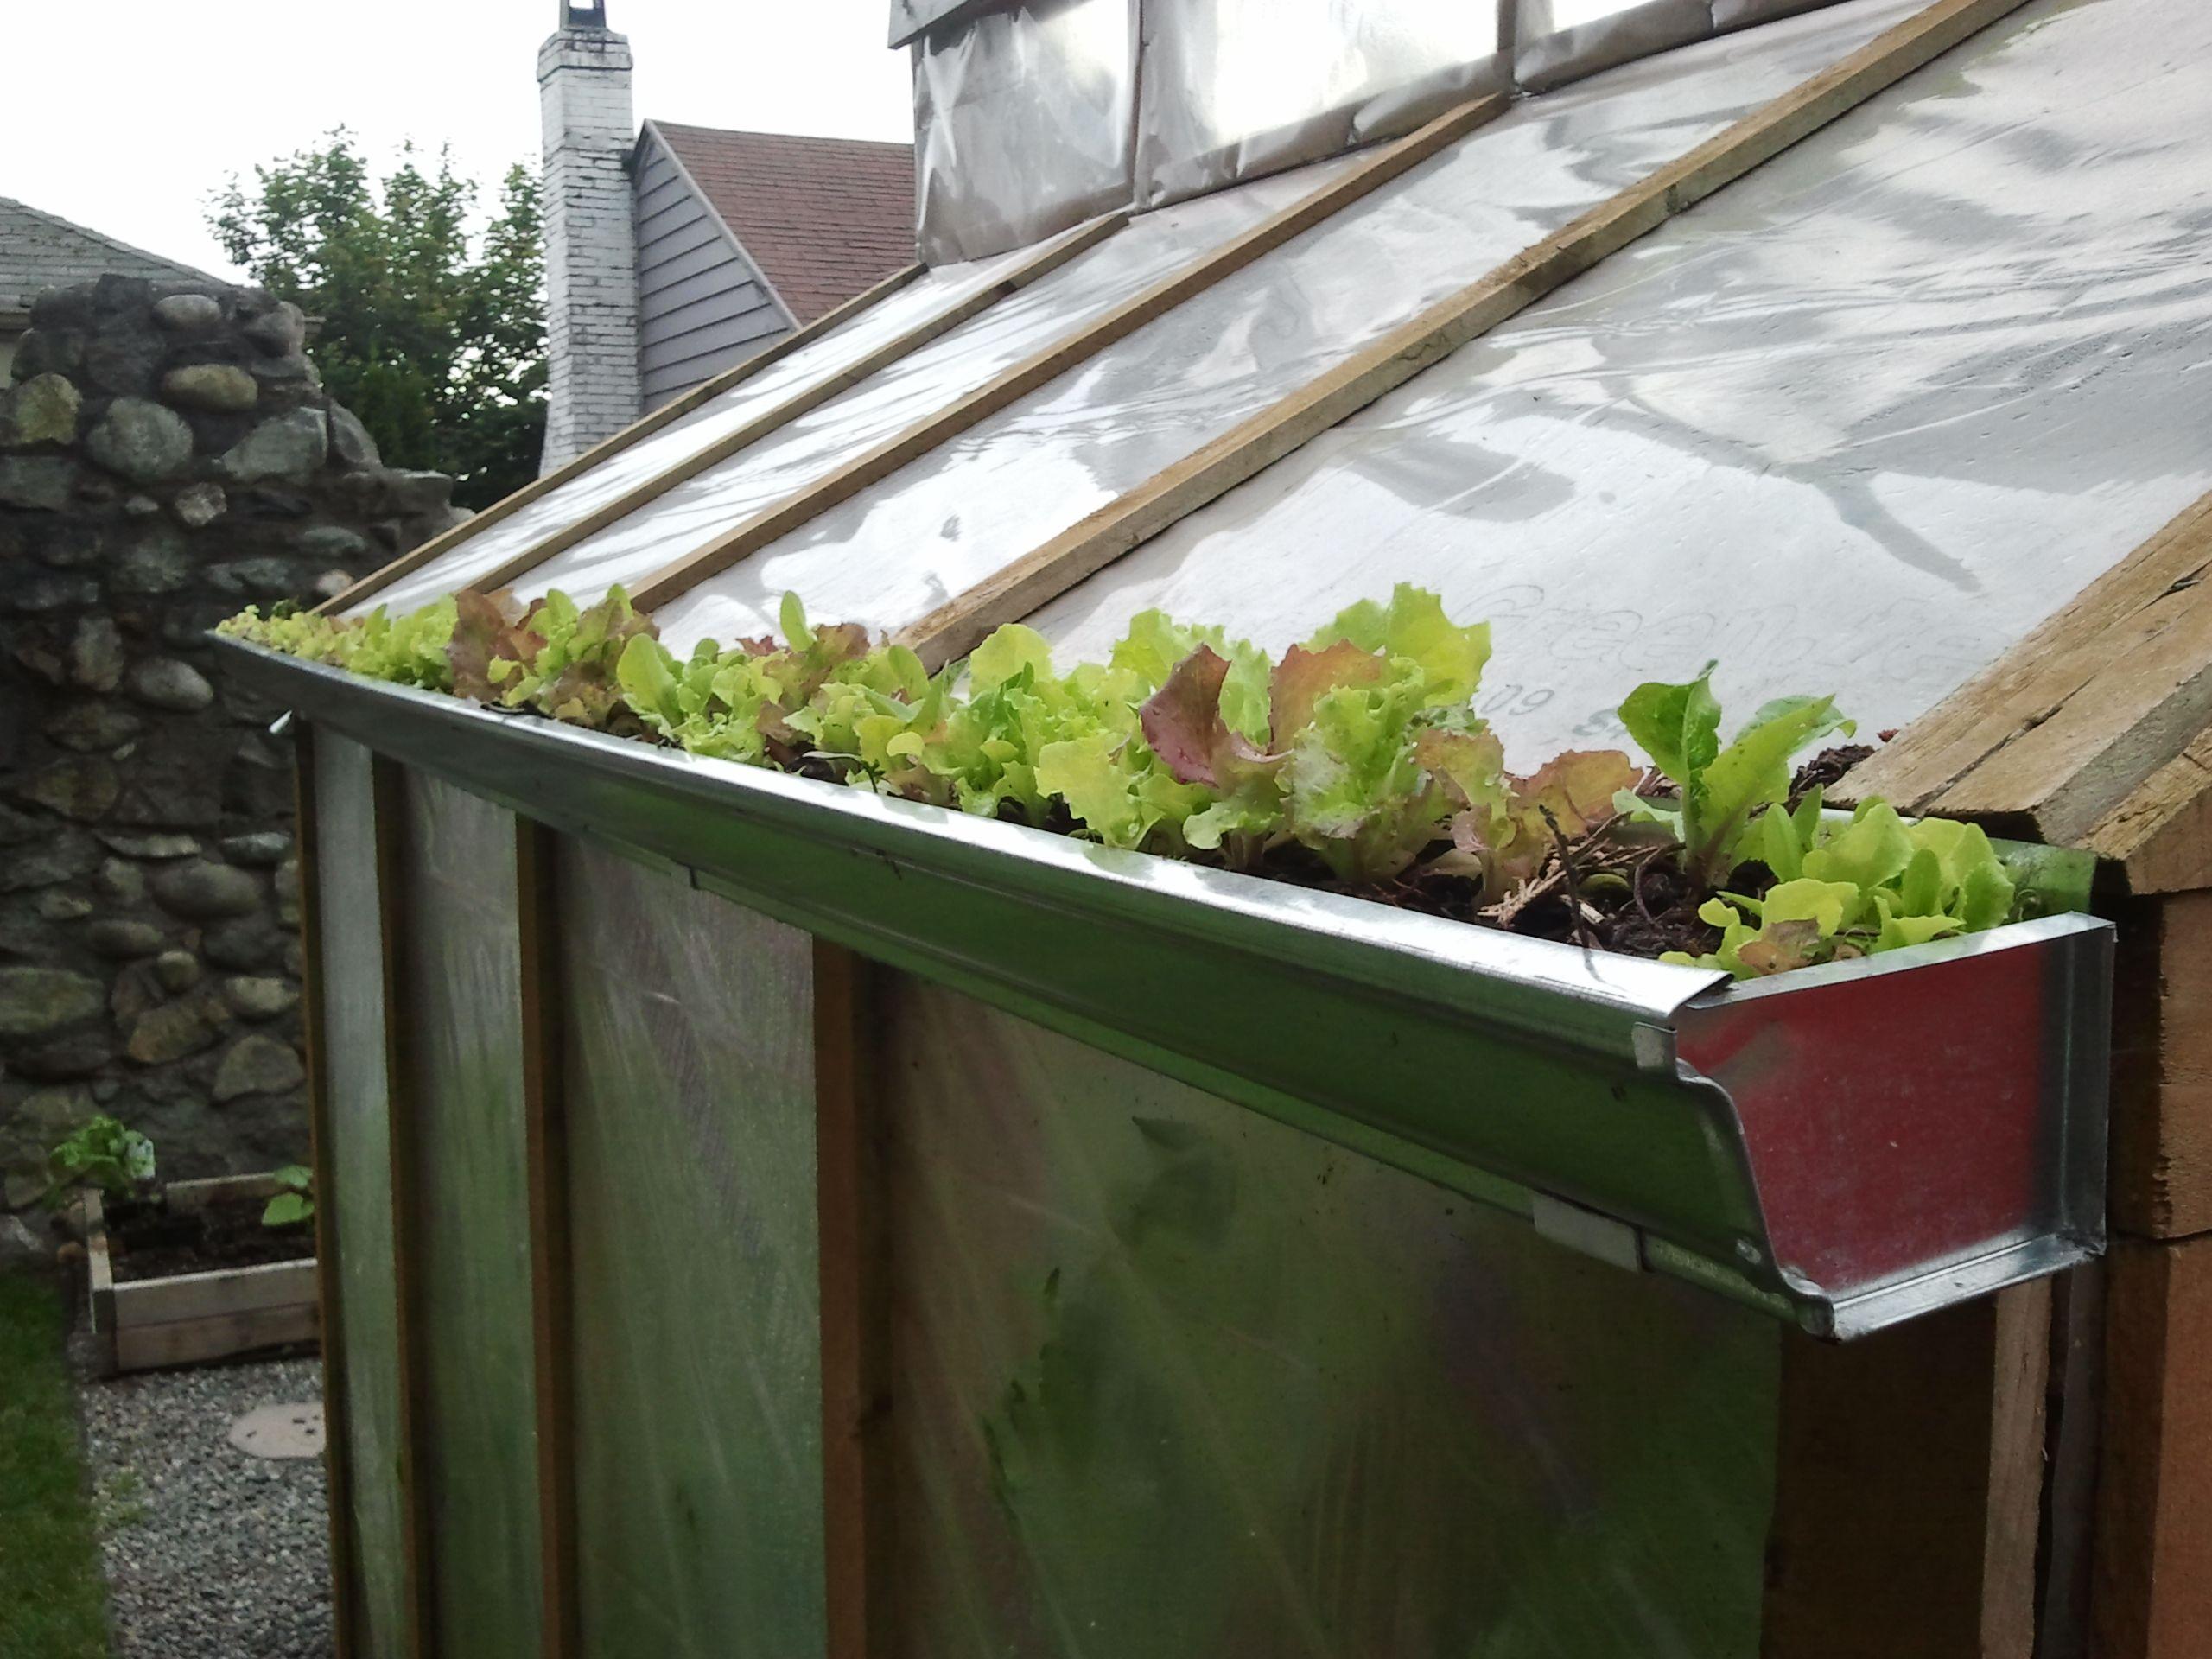 Gutter Lettuce Gutter Garden Growing Vegetables Growing Organic Vegetables